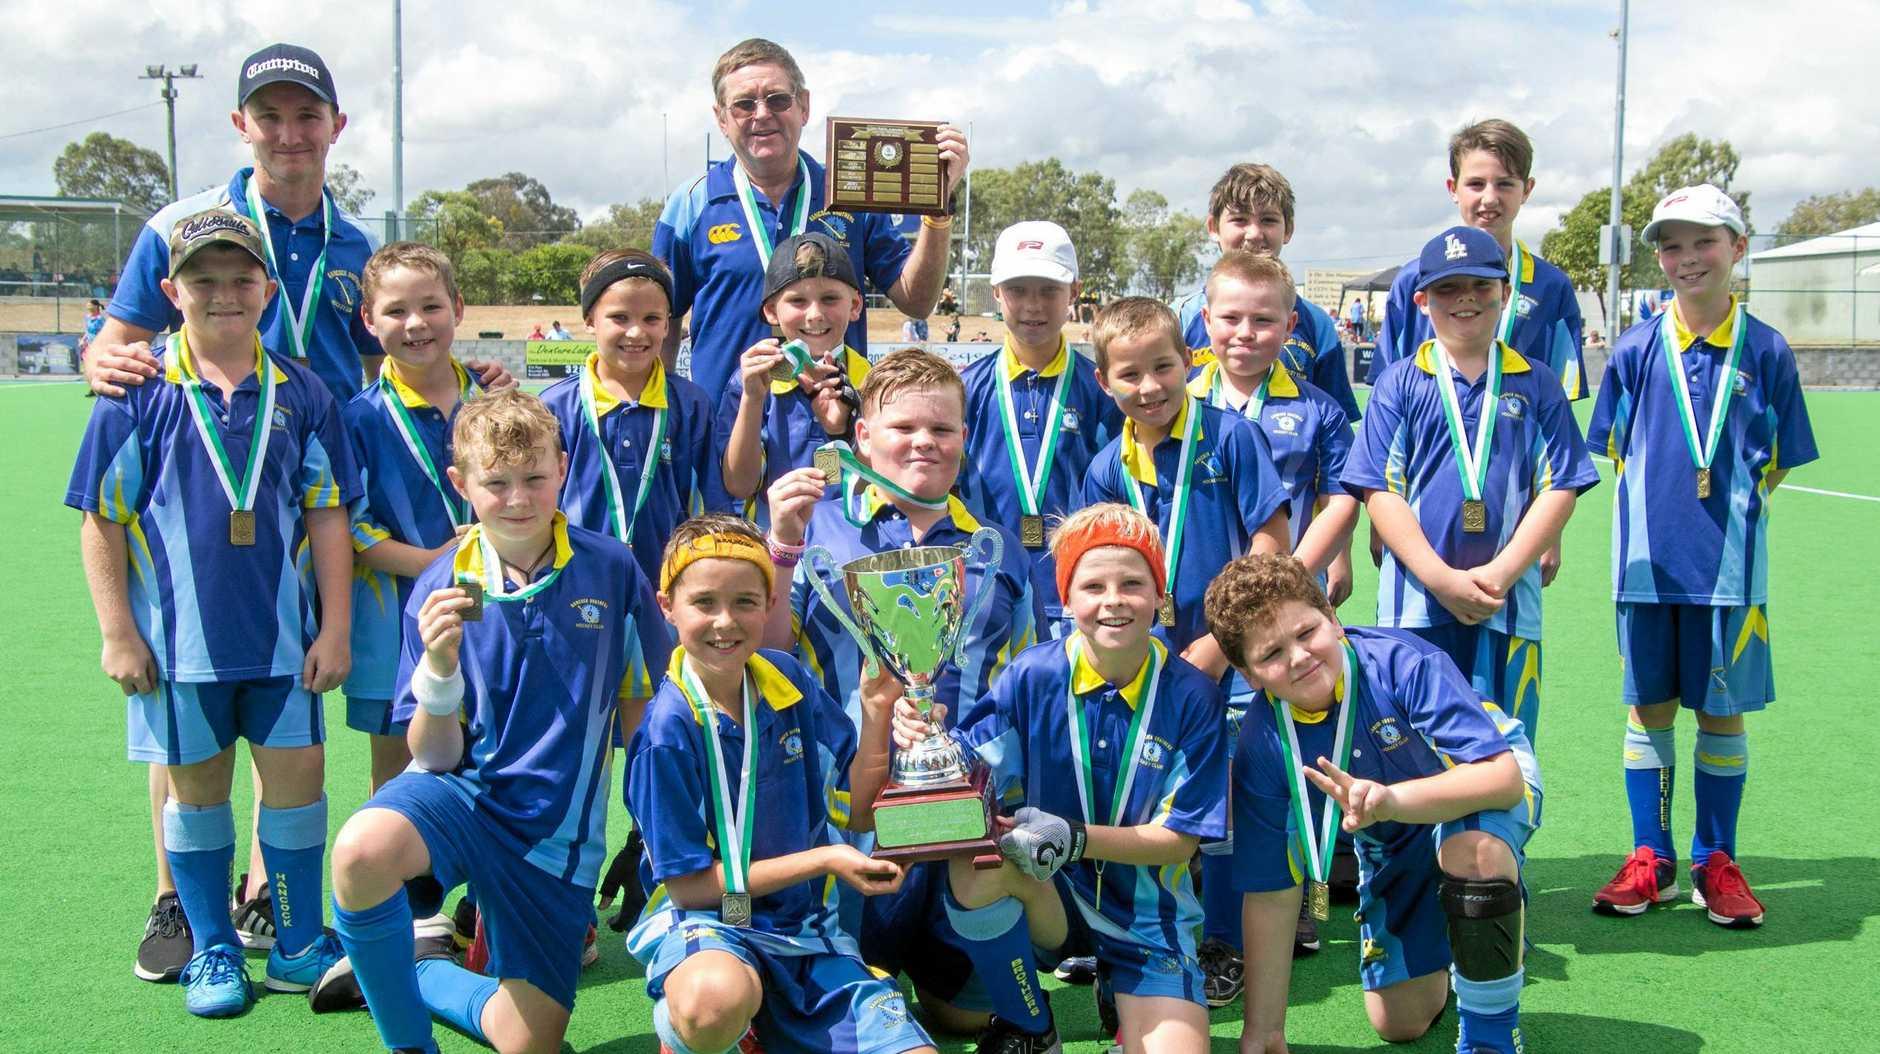 The Hancocks E-Grade team that won the grand final.